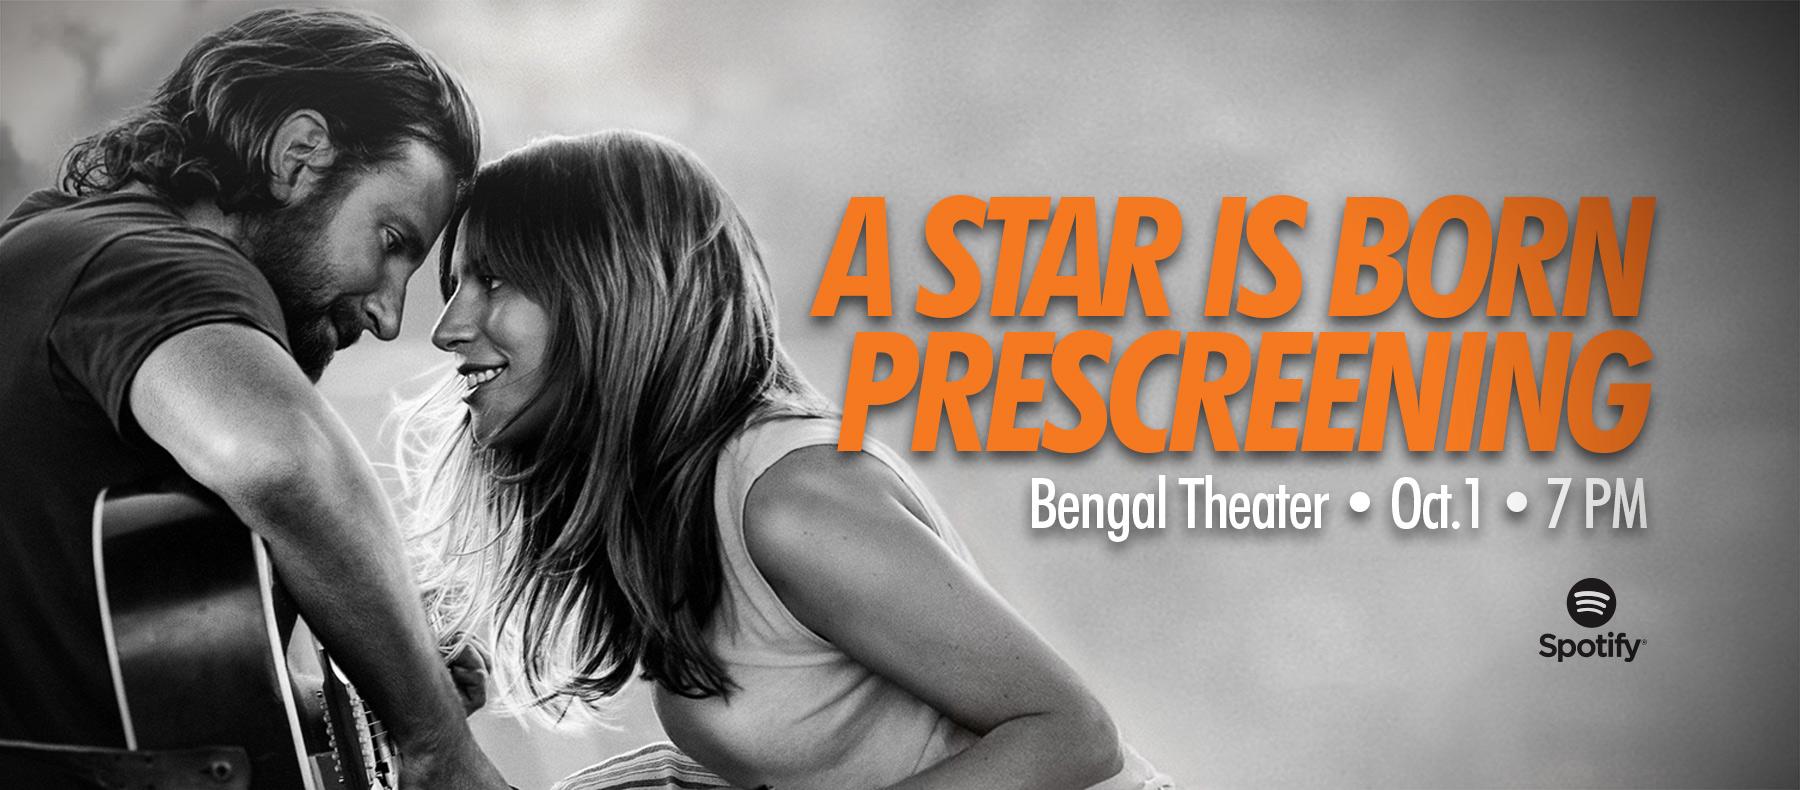 A Star Is Born Prescreening Bengal Theater Ct. 1 7 P.m. Spotify